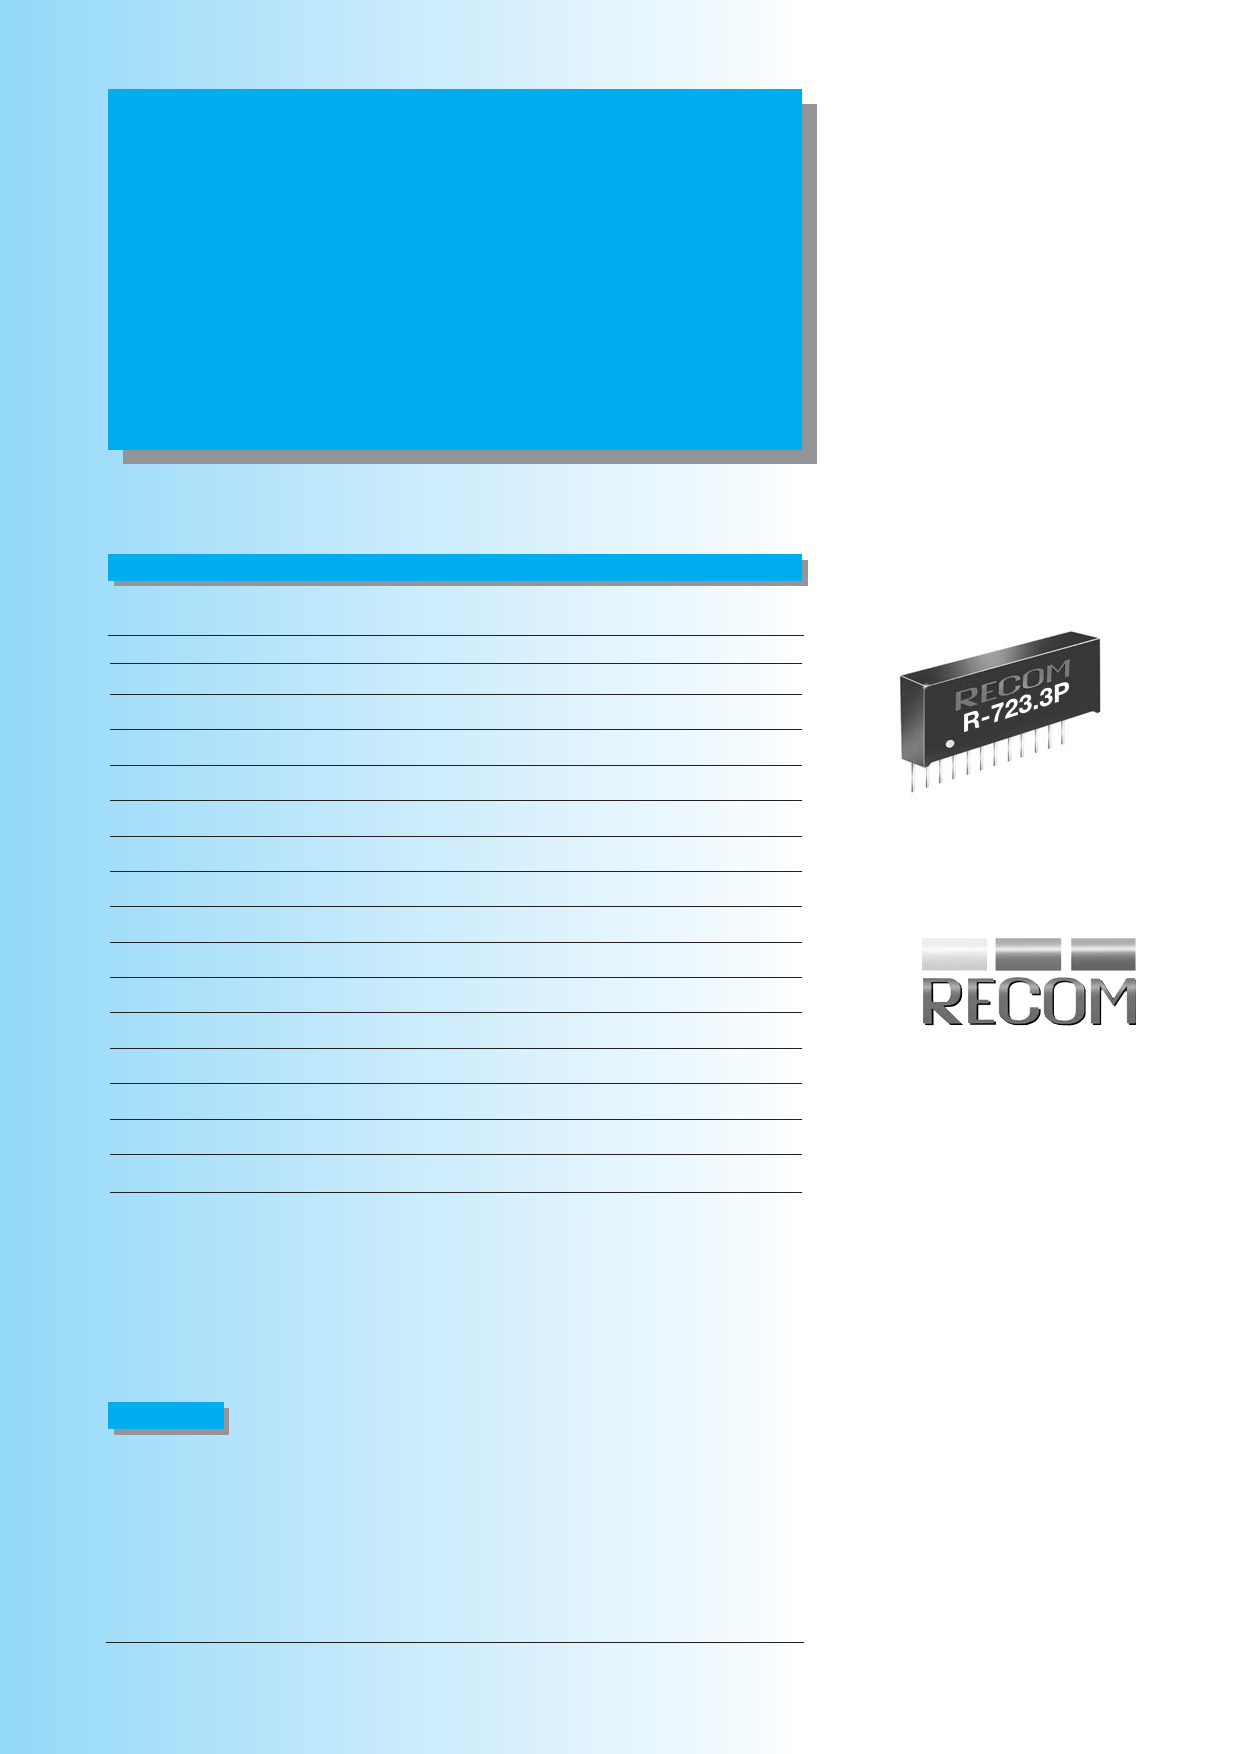 R-7xxxxD datasheet